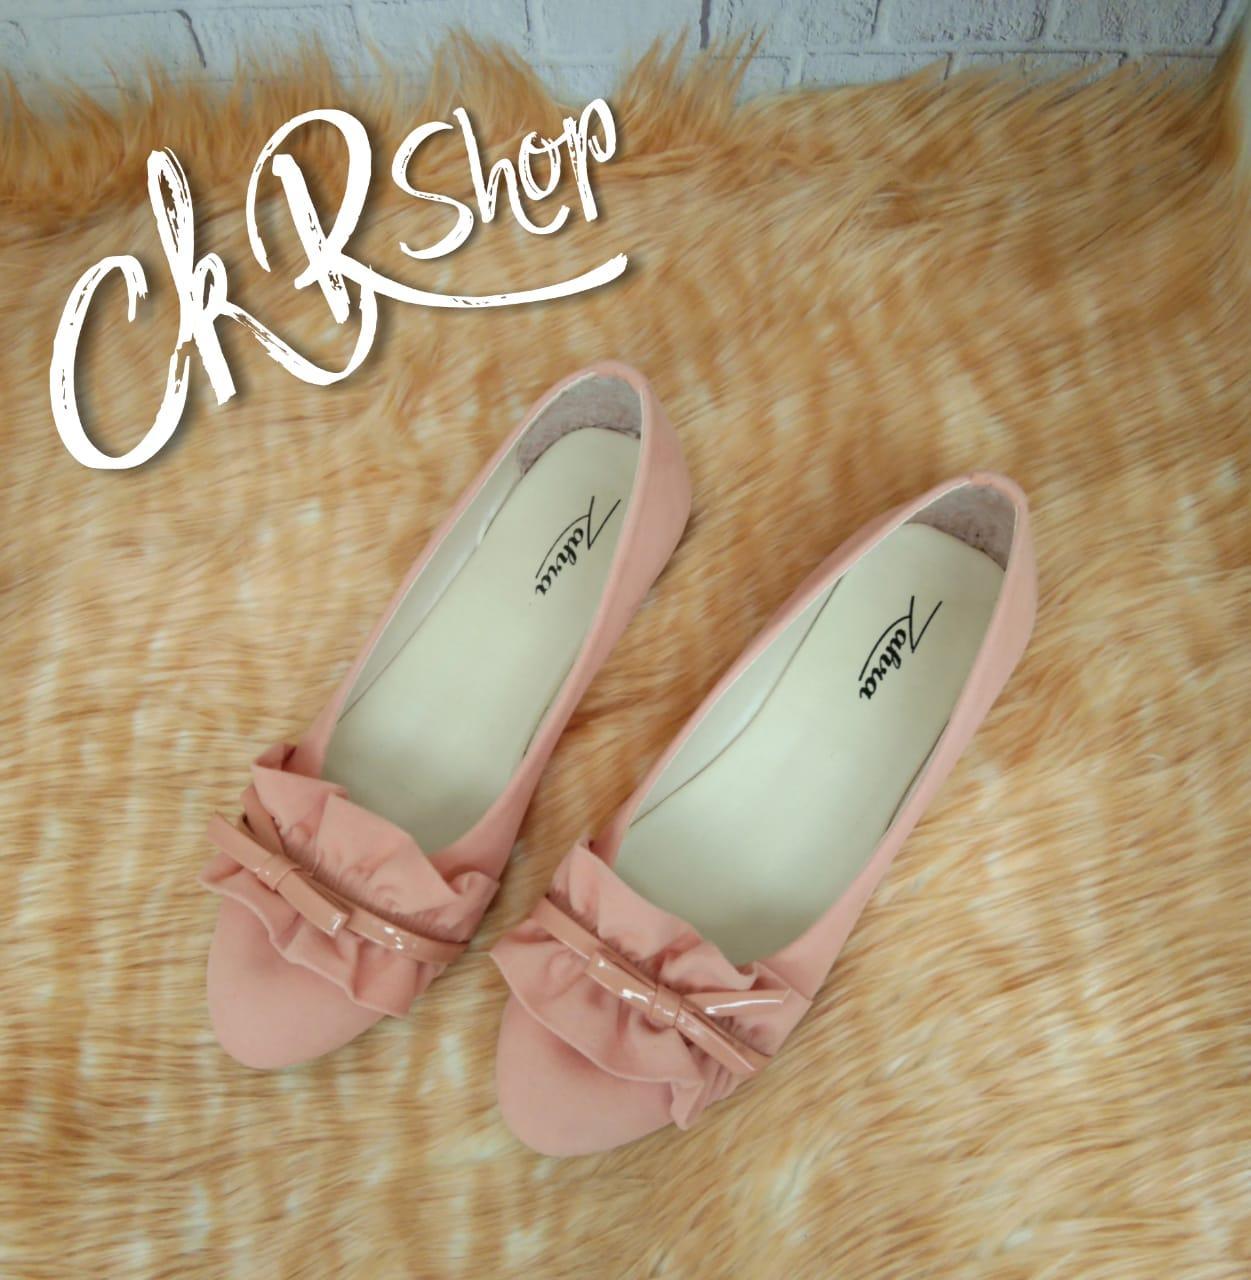 CKR Shop - Sepatu Wanita Pita Rempel ZR - 19